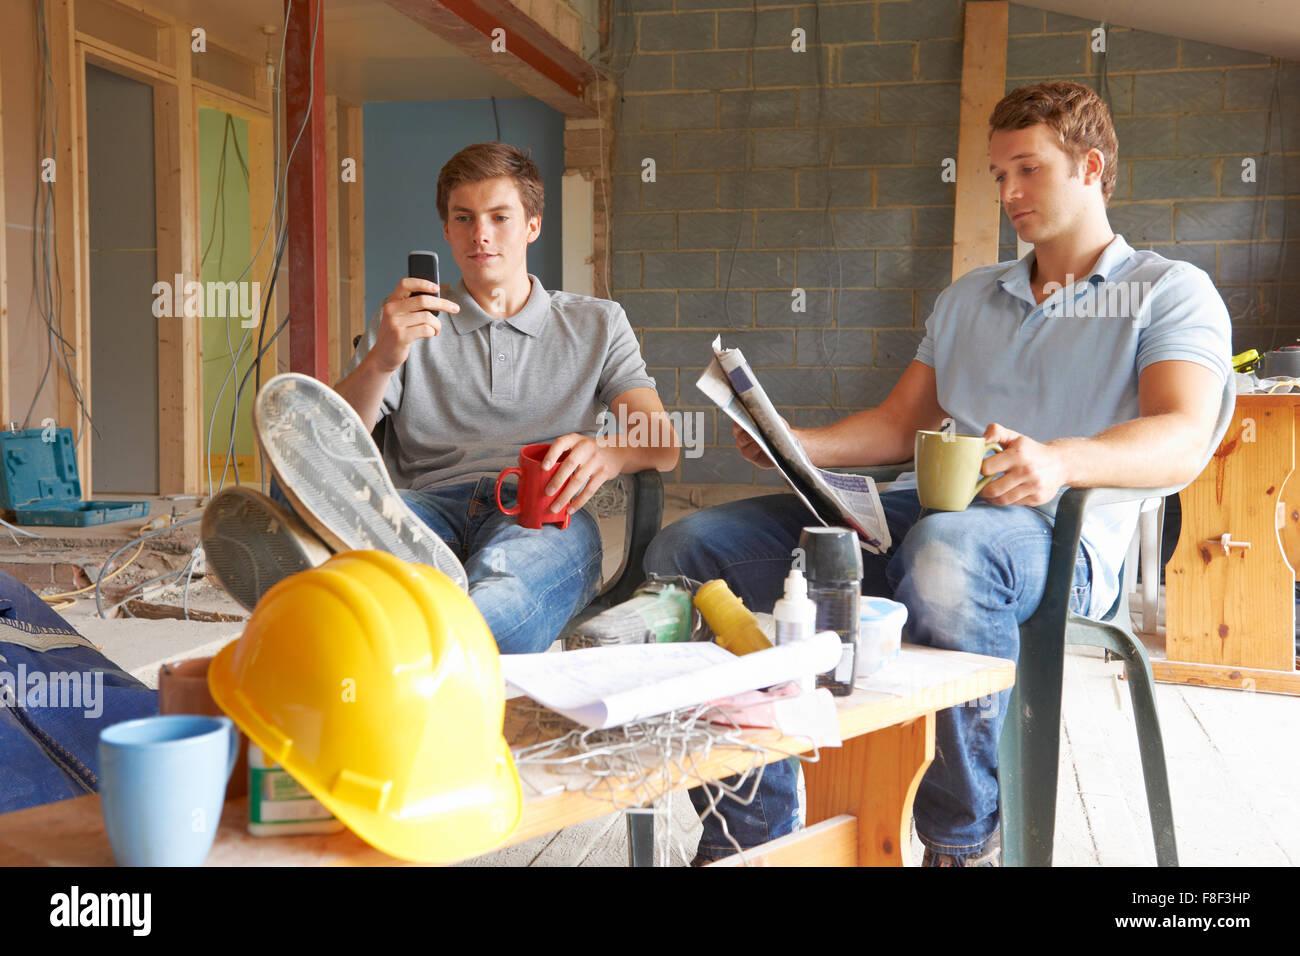 Builders Relaxing During Break On Site - Stock Image